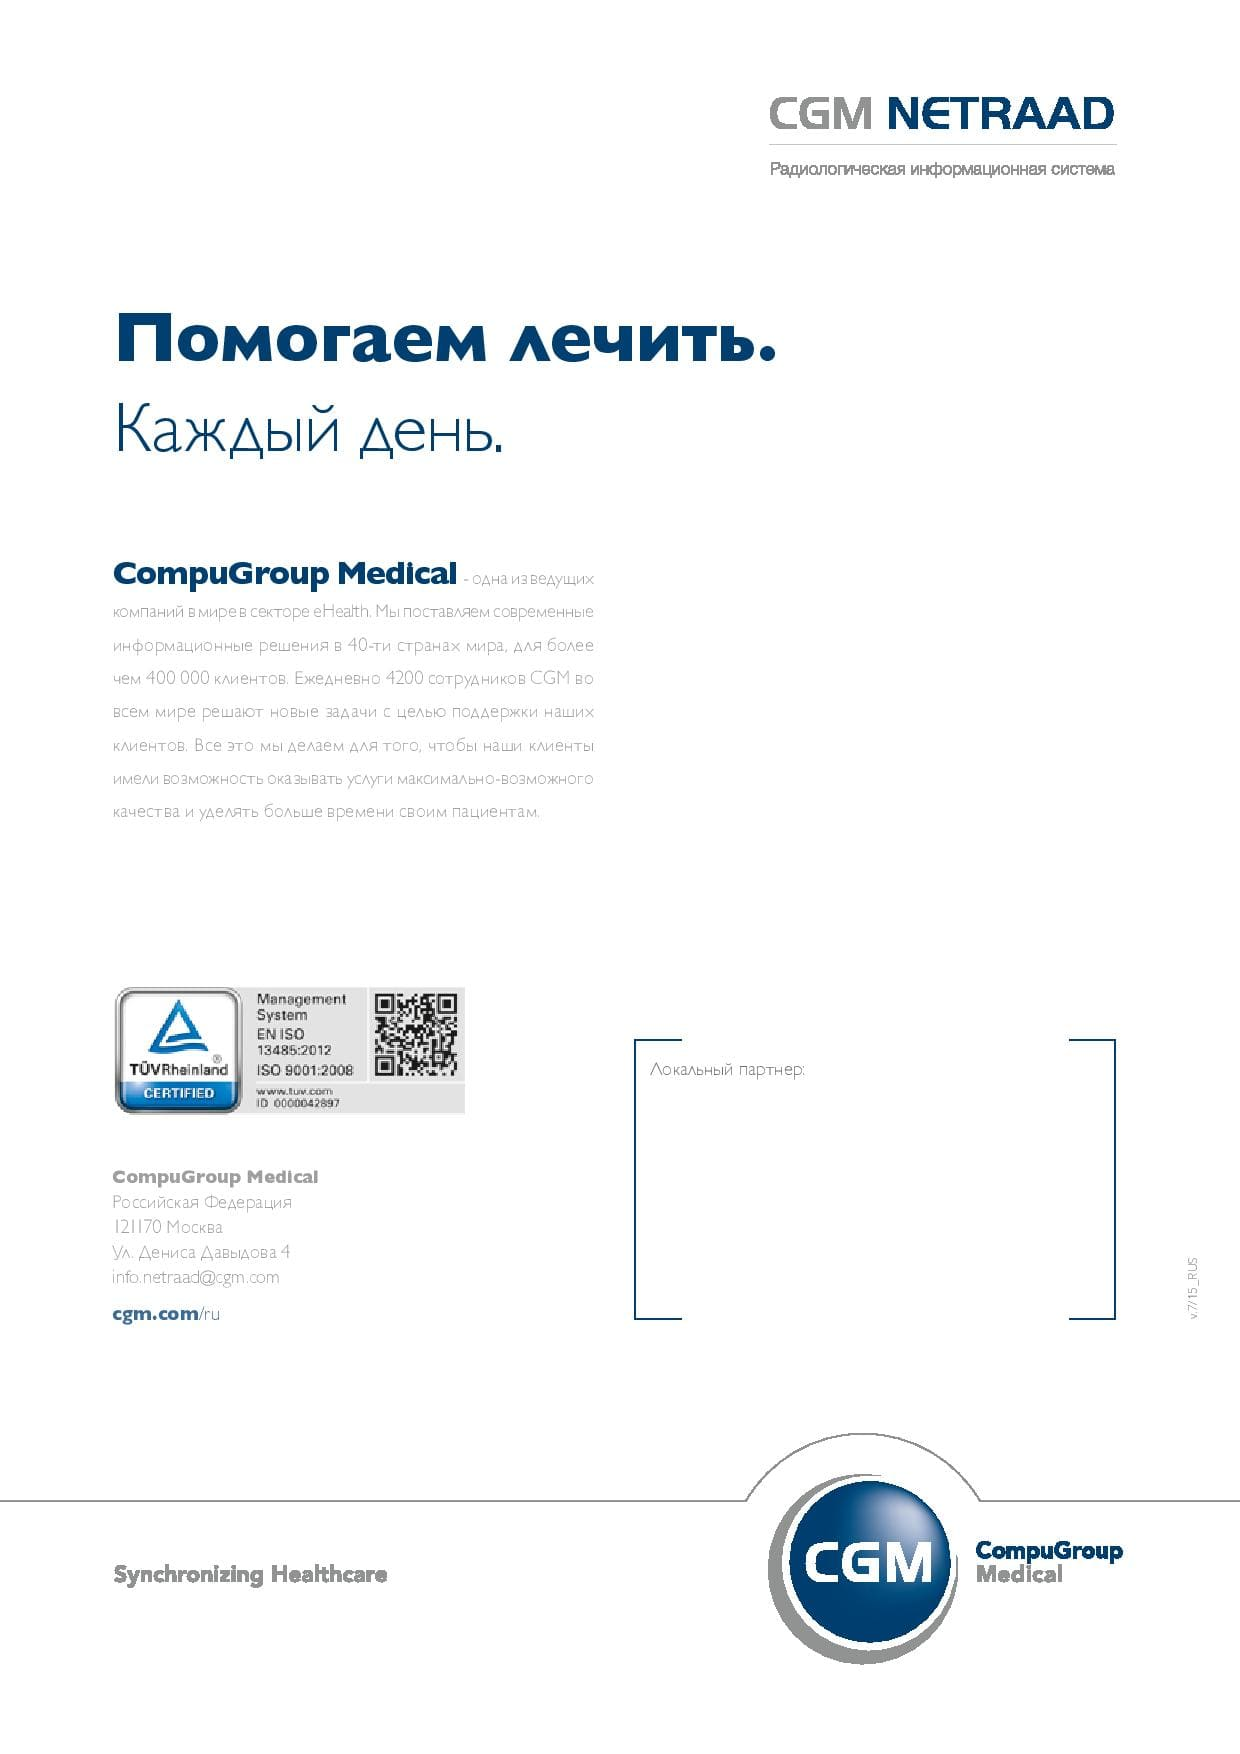 CGM_NETRAAD_RUS-page-016